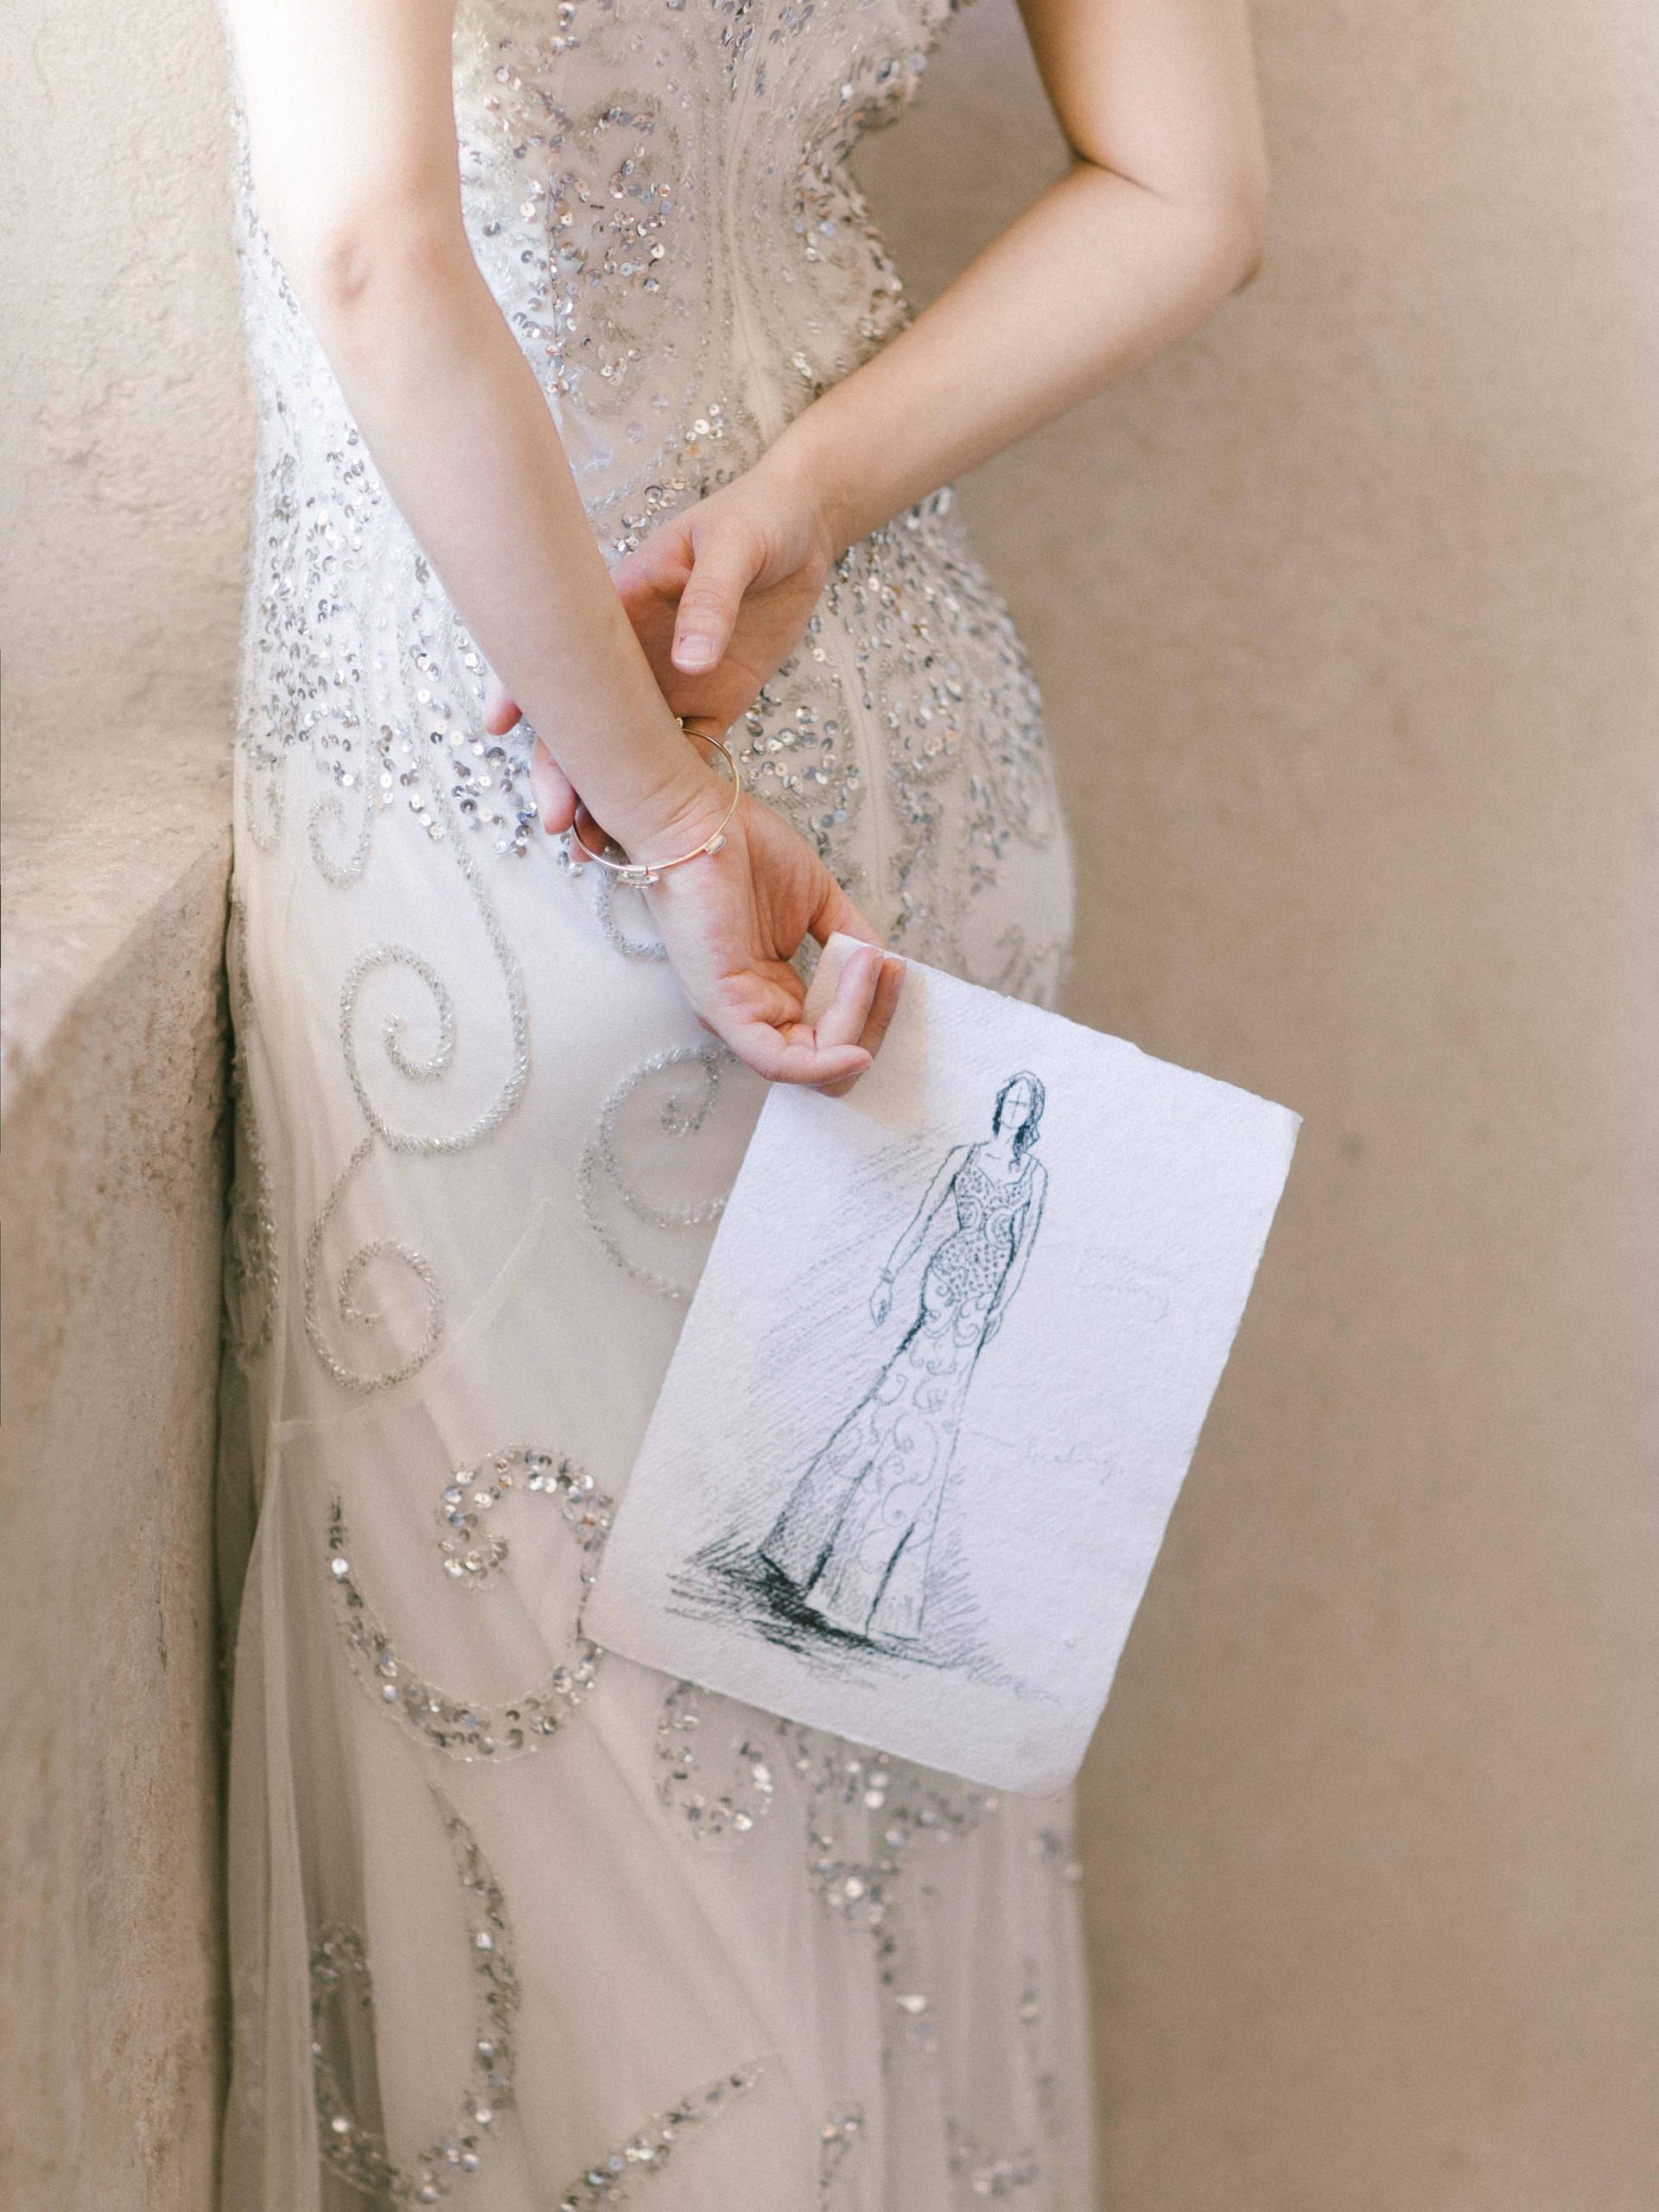 Lukas Chan Photo Lab - Ivy Solo - website-44.jpg